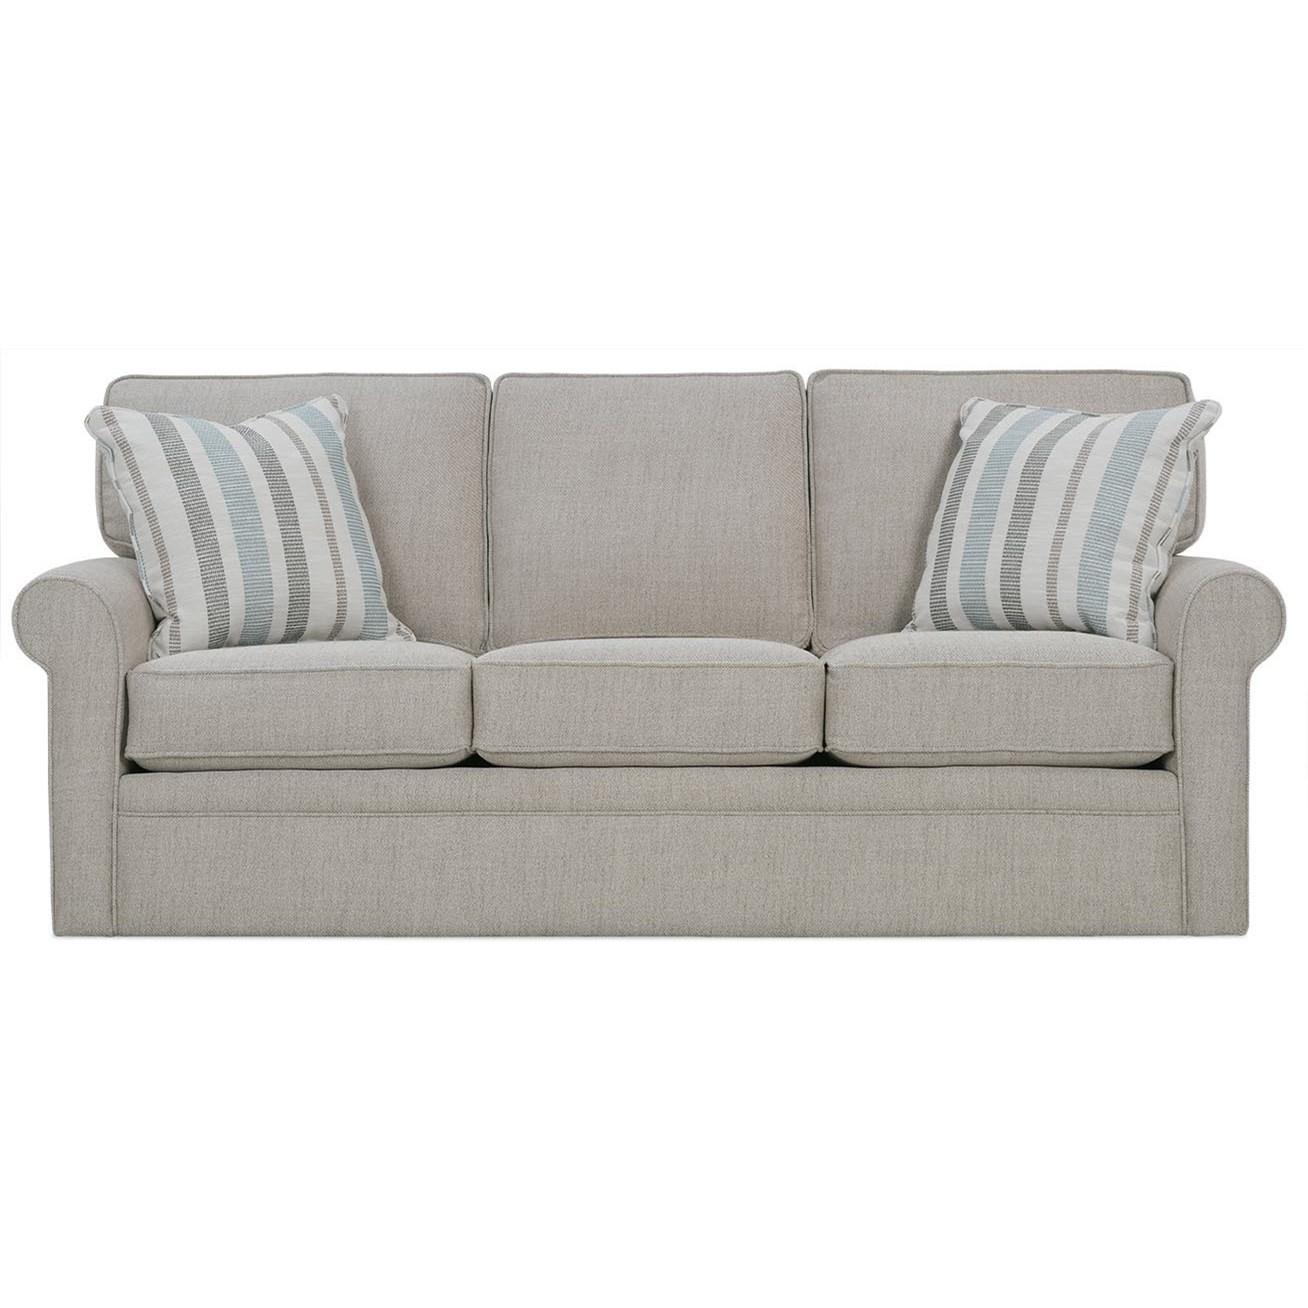 Dalton Stationary Sofa by Rowe at Baer's Furniture